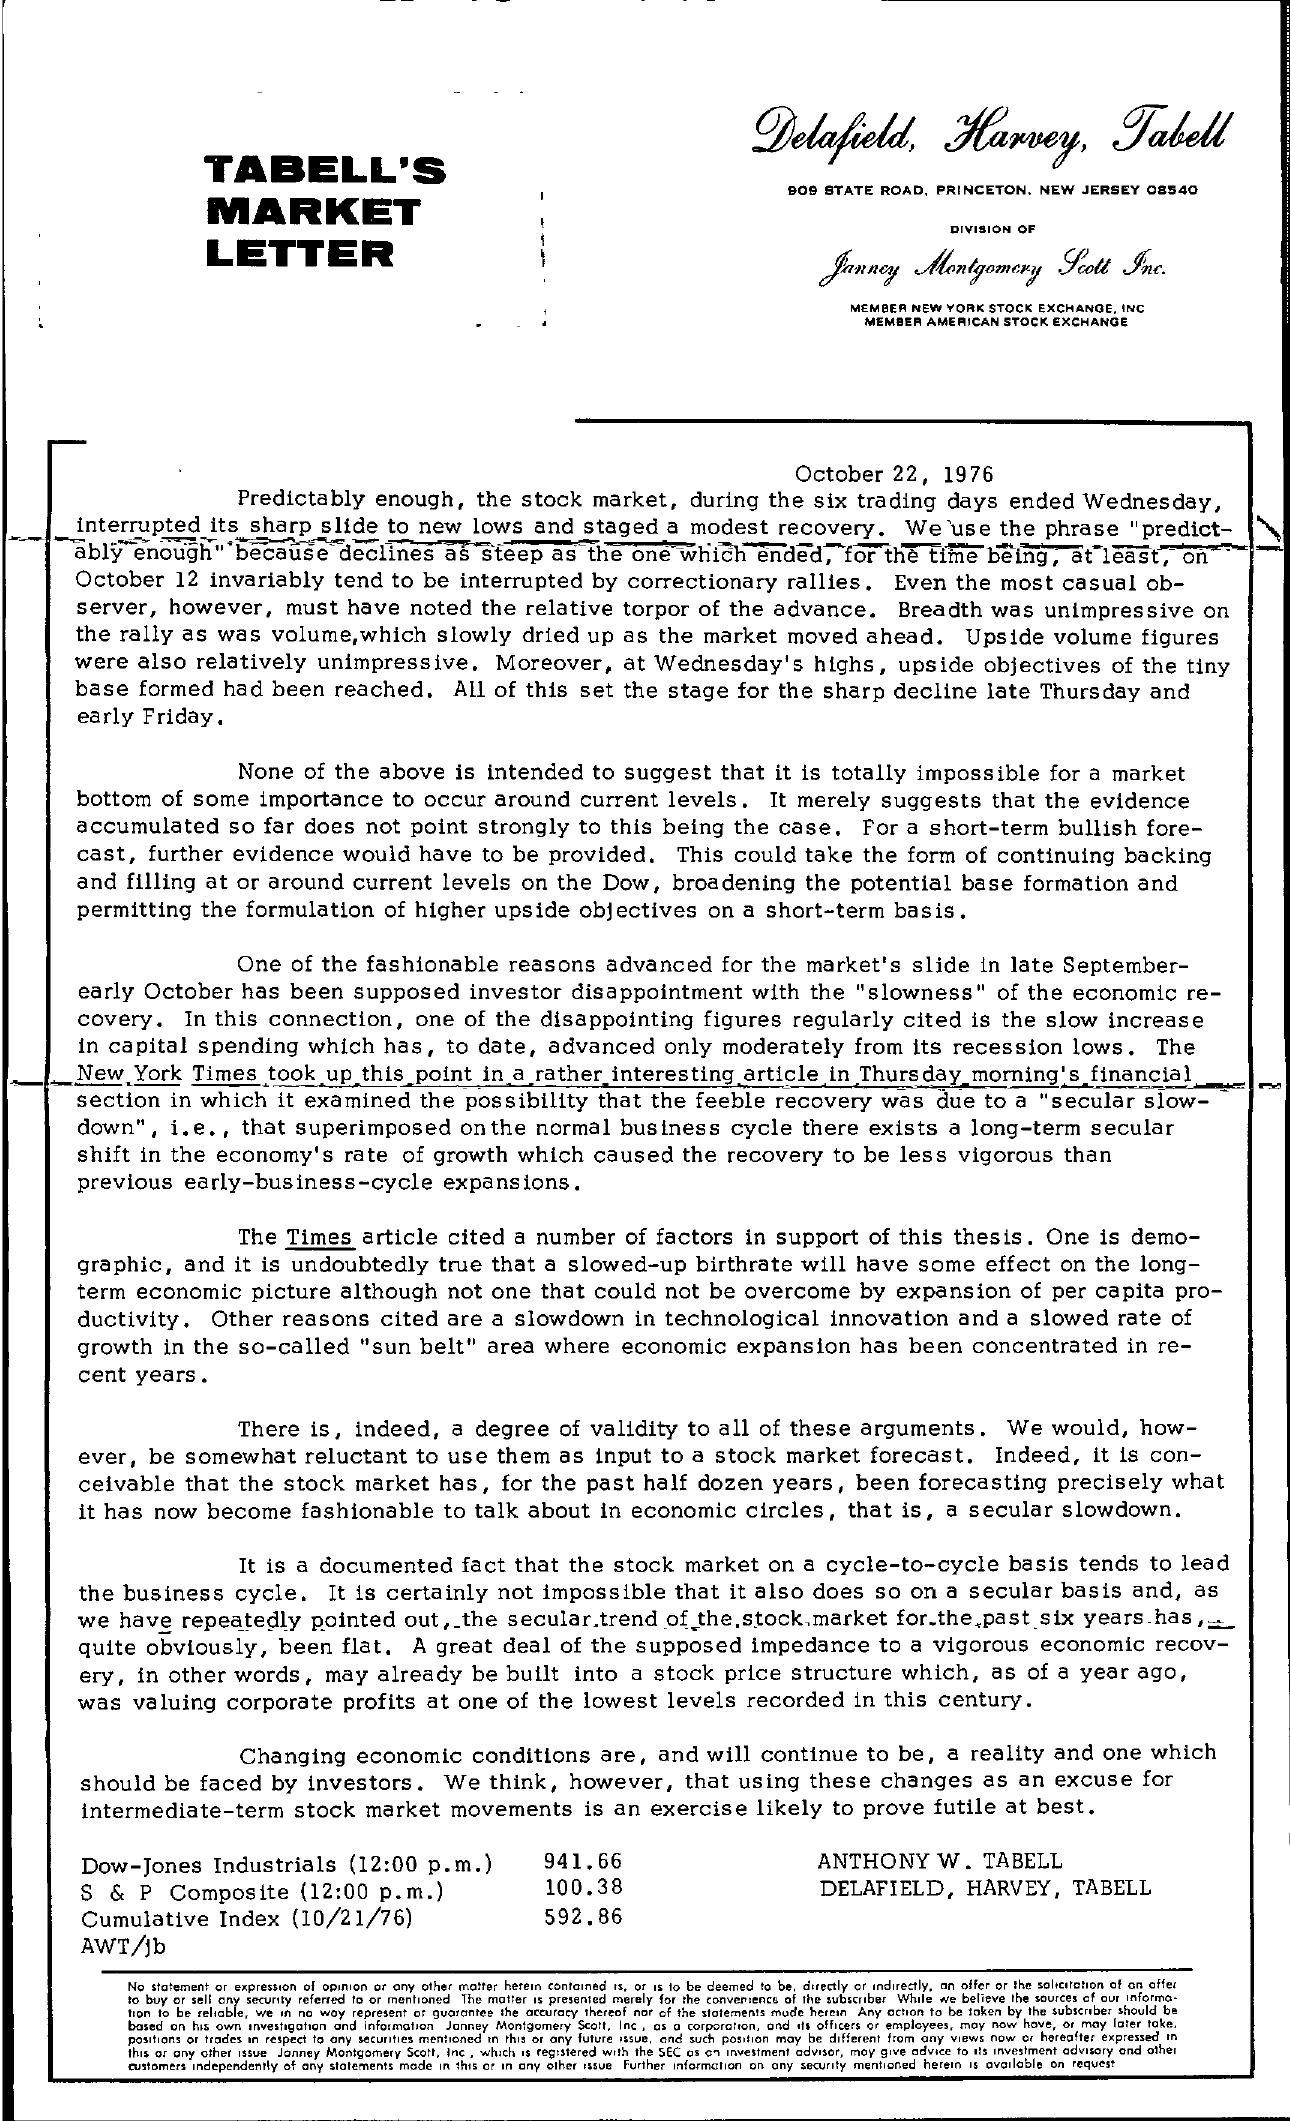 Tabell's Market Letter - October 22, 1976